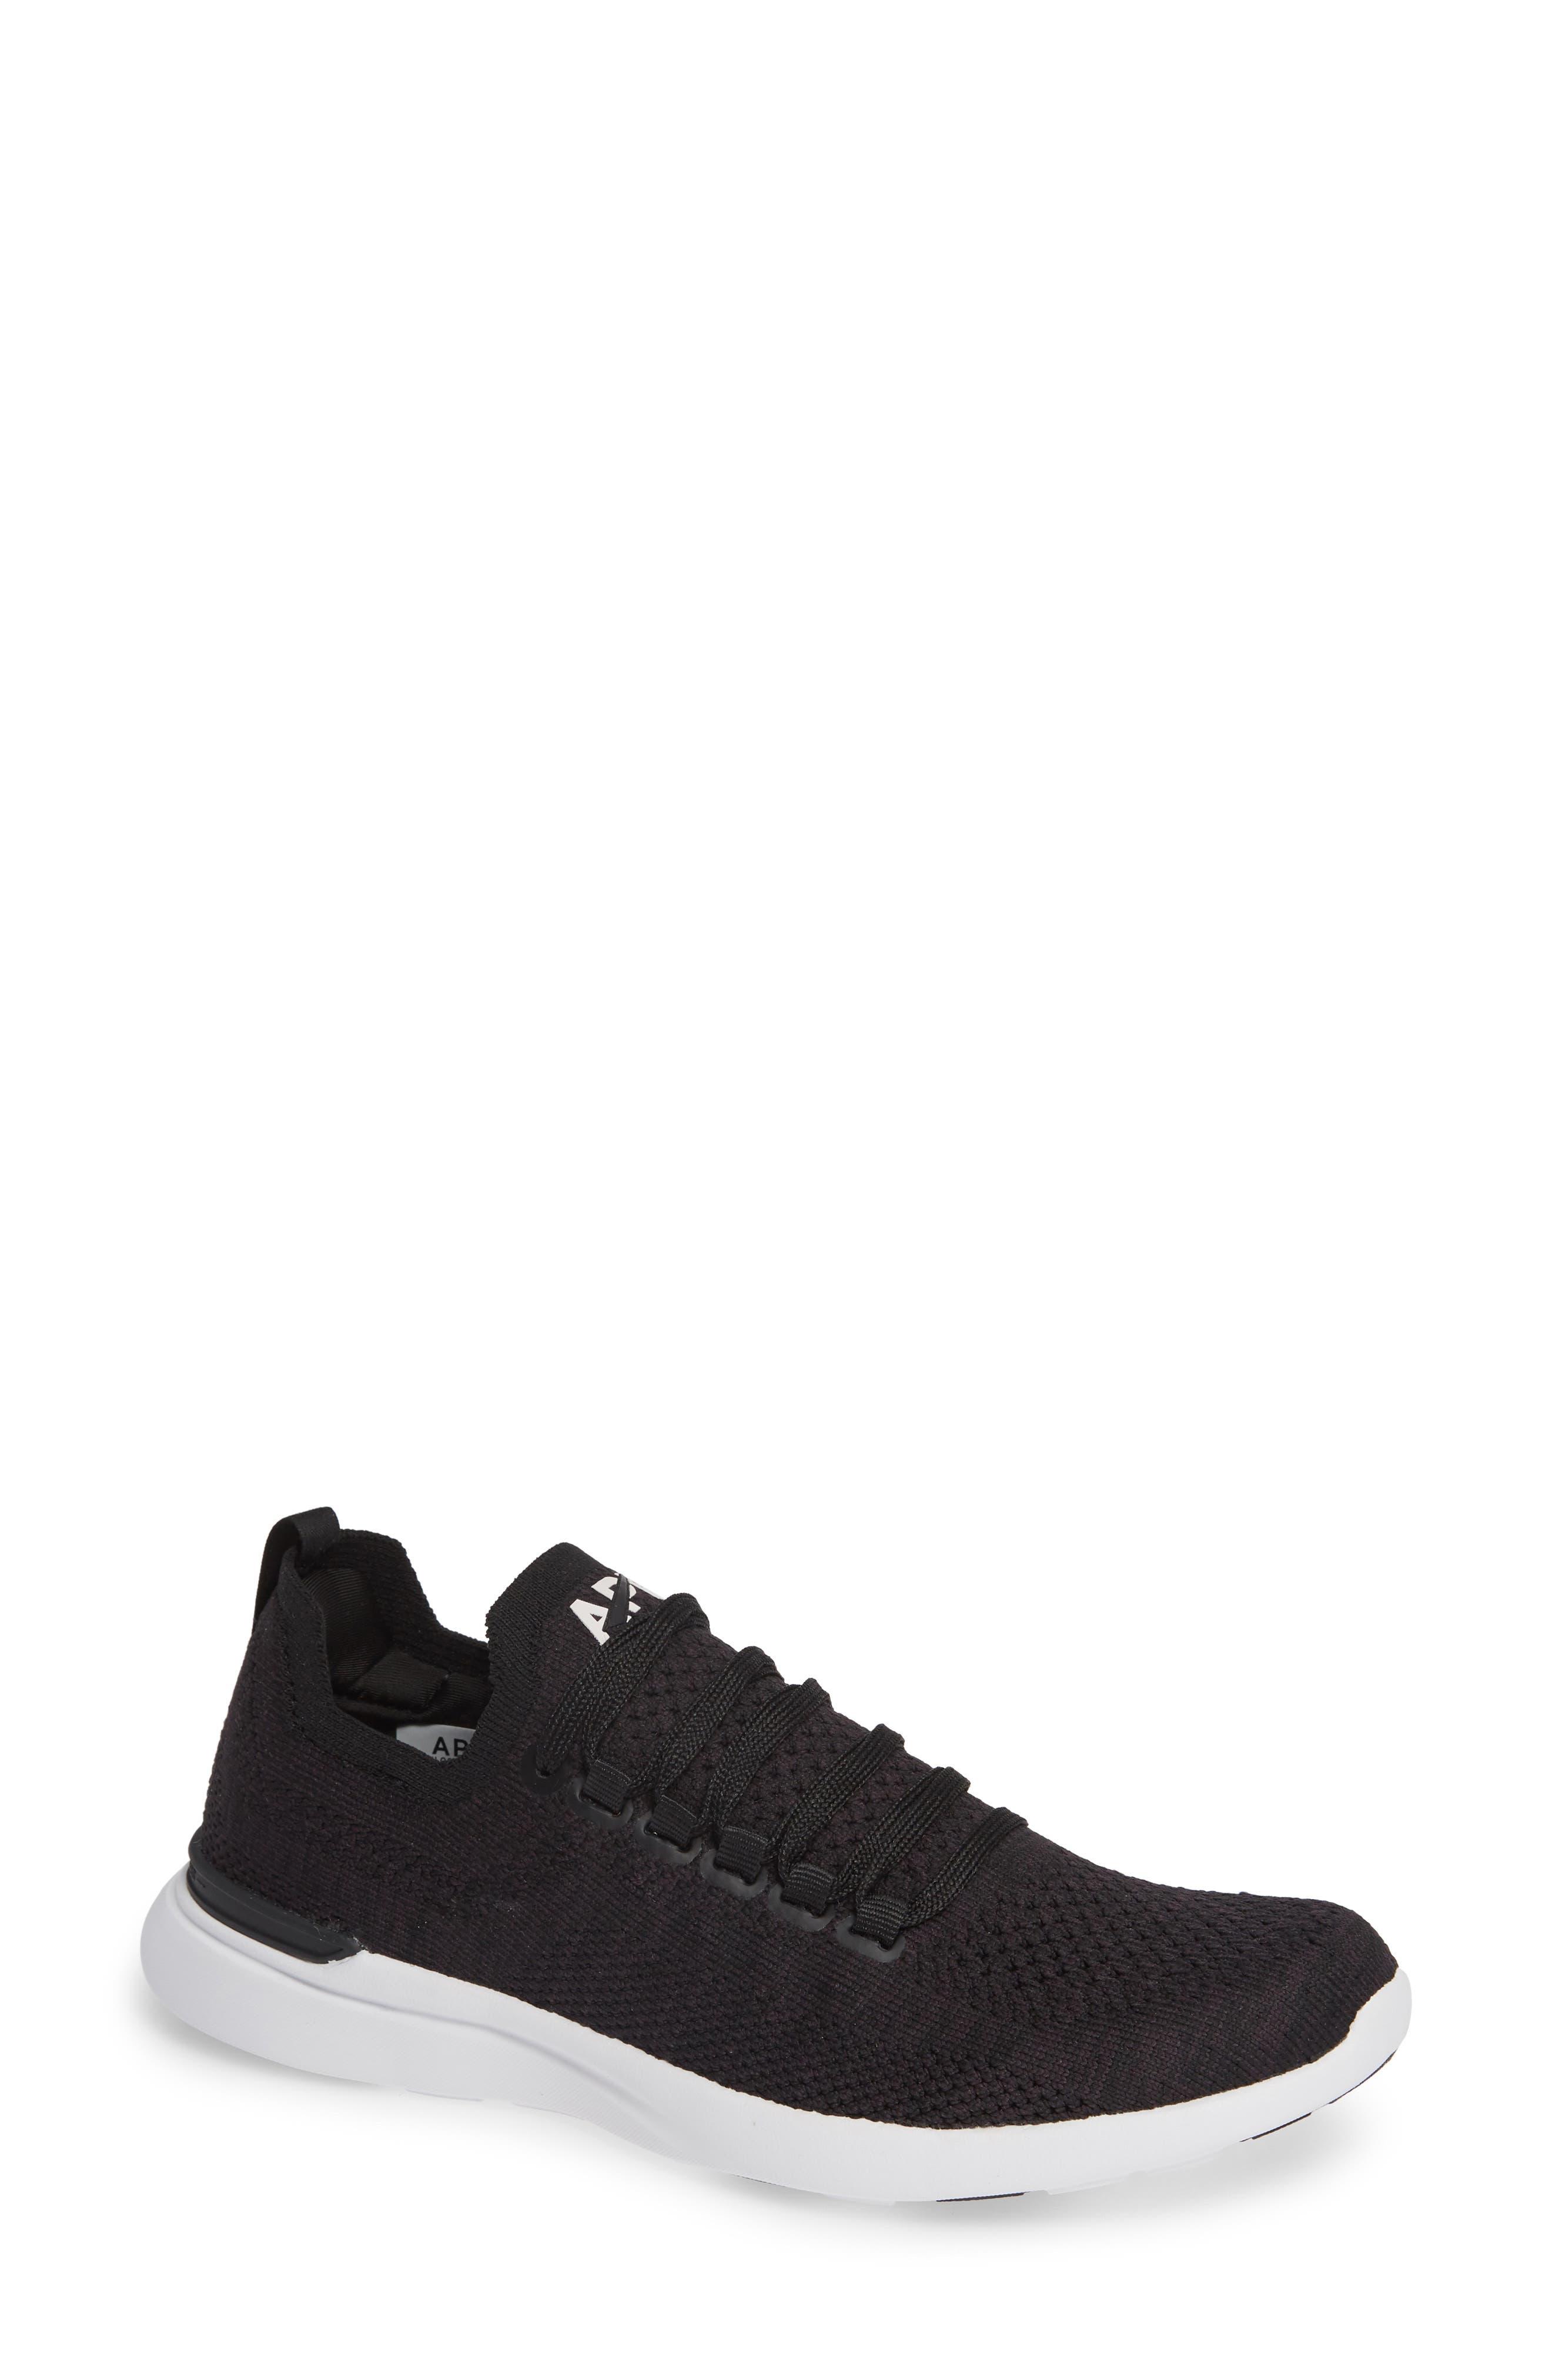 Techloom Breeze Knit Running Shoe, Main, color, BLACK/ BLACK/ WHITE